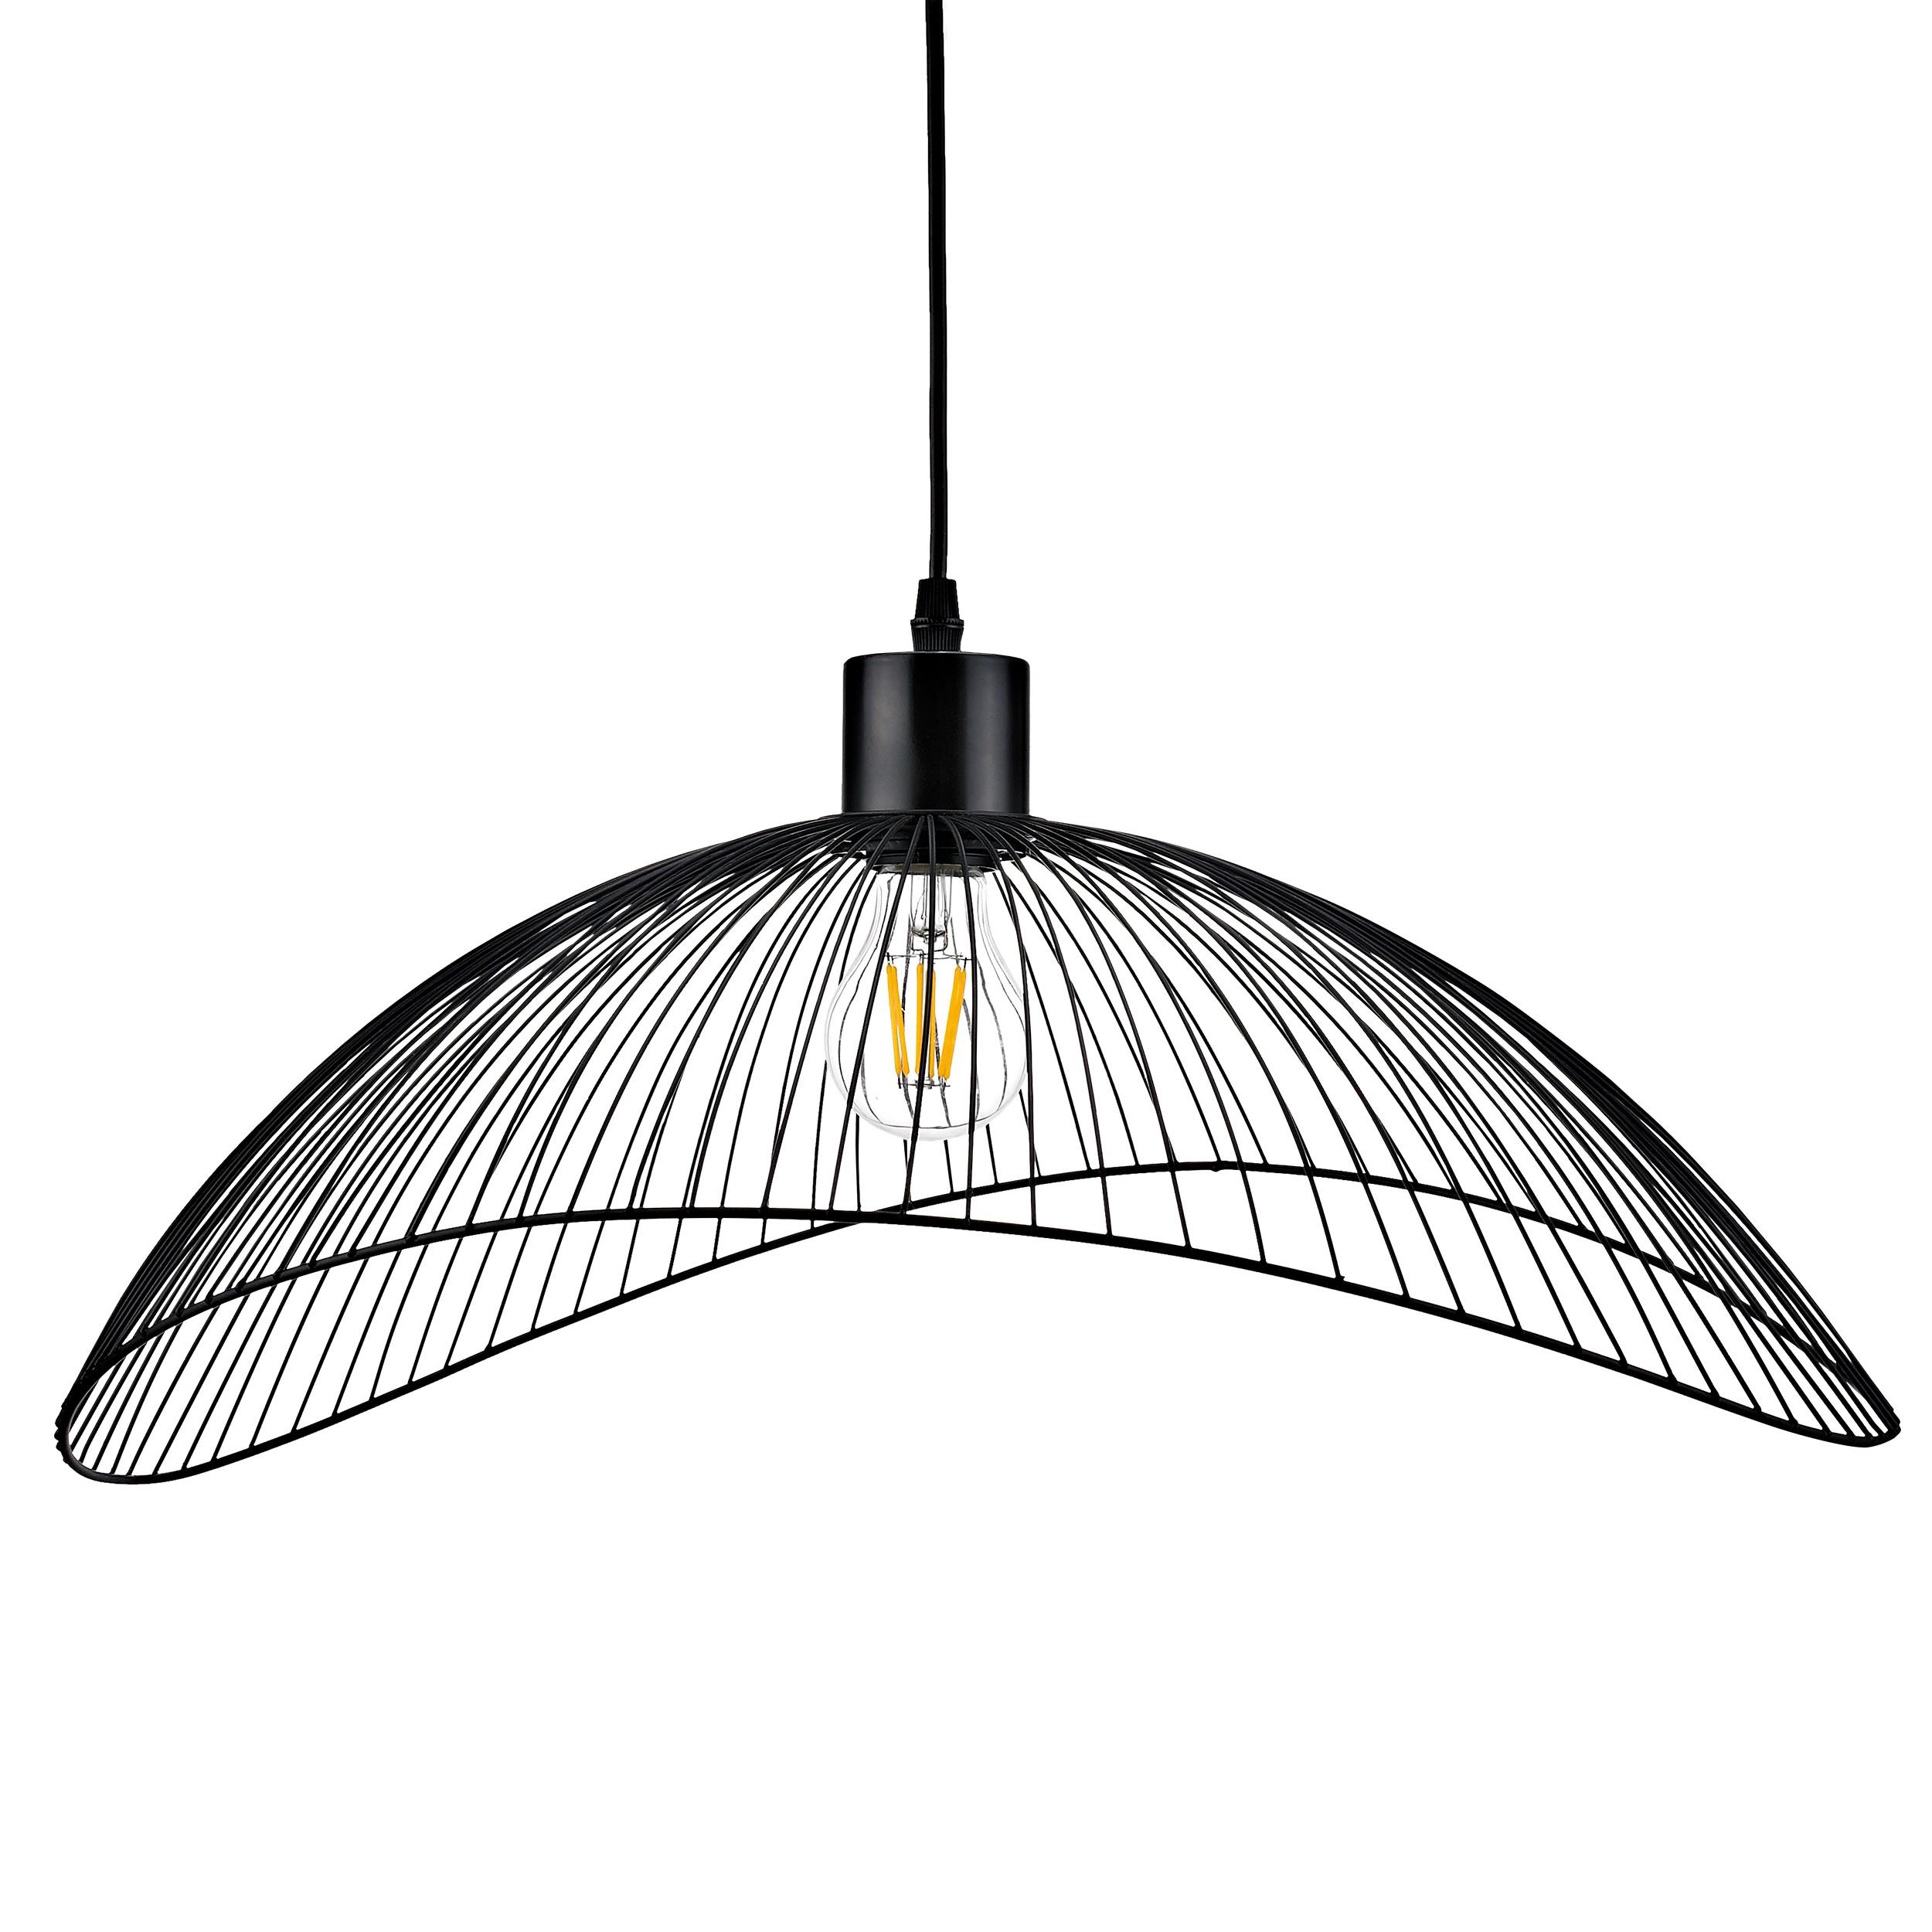 Lampa wisząca AJE-HOLLY 6 Black 1xE27 50cm